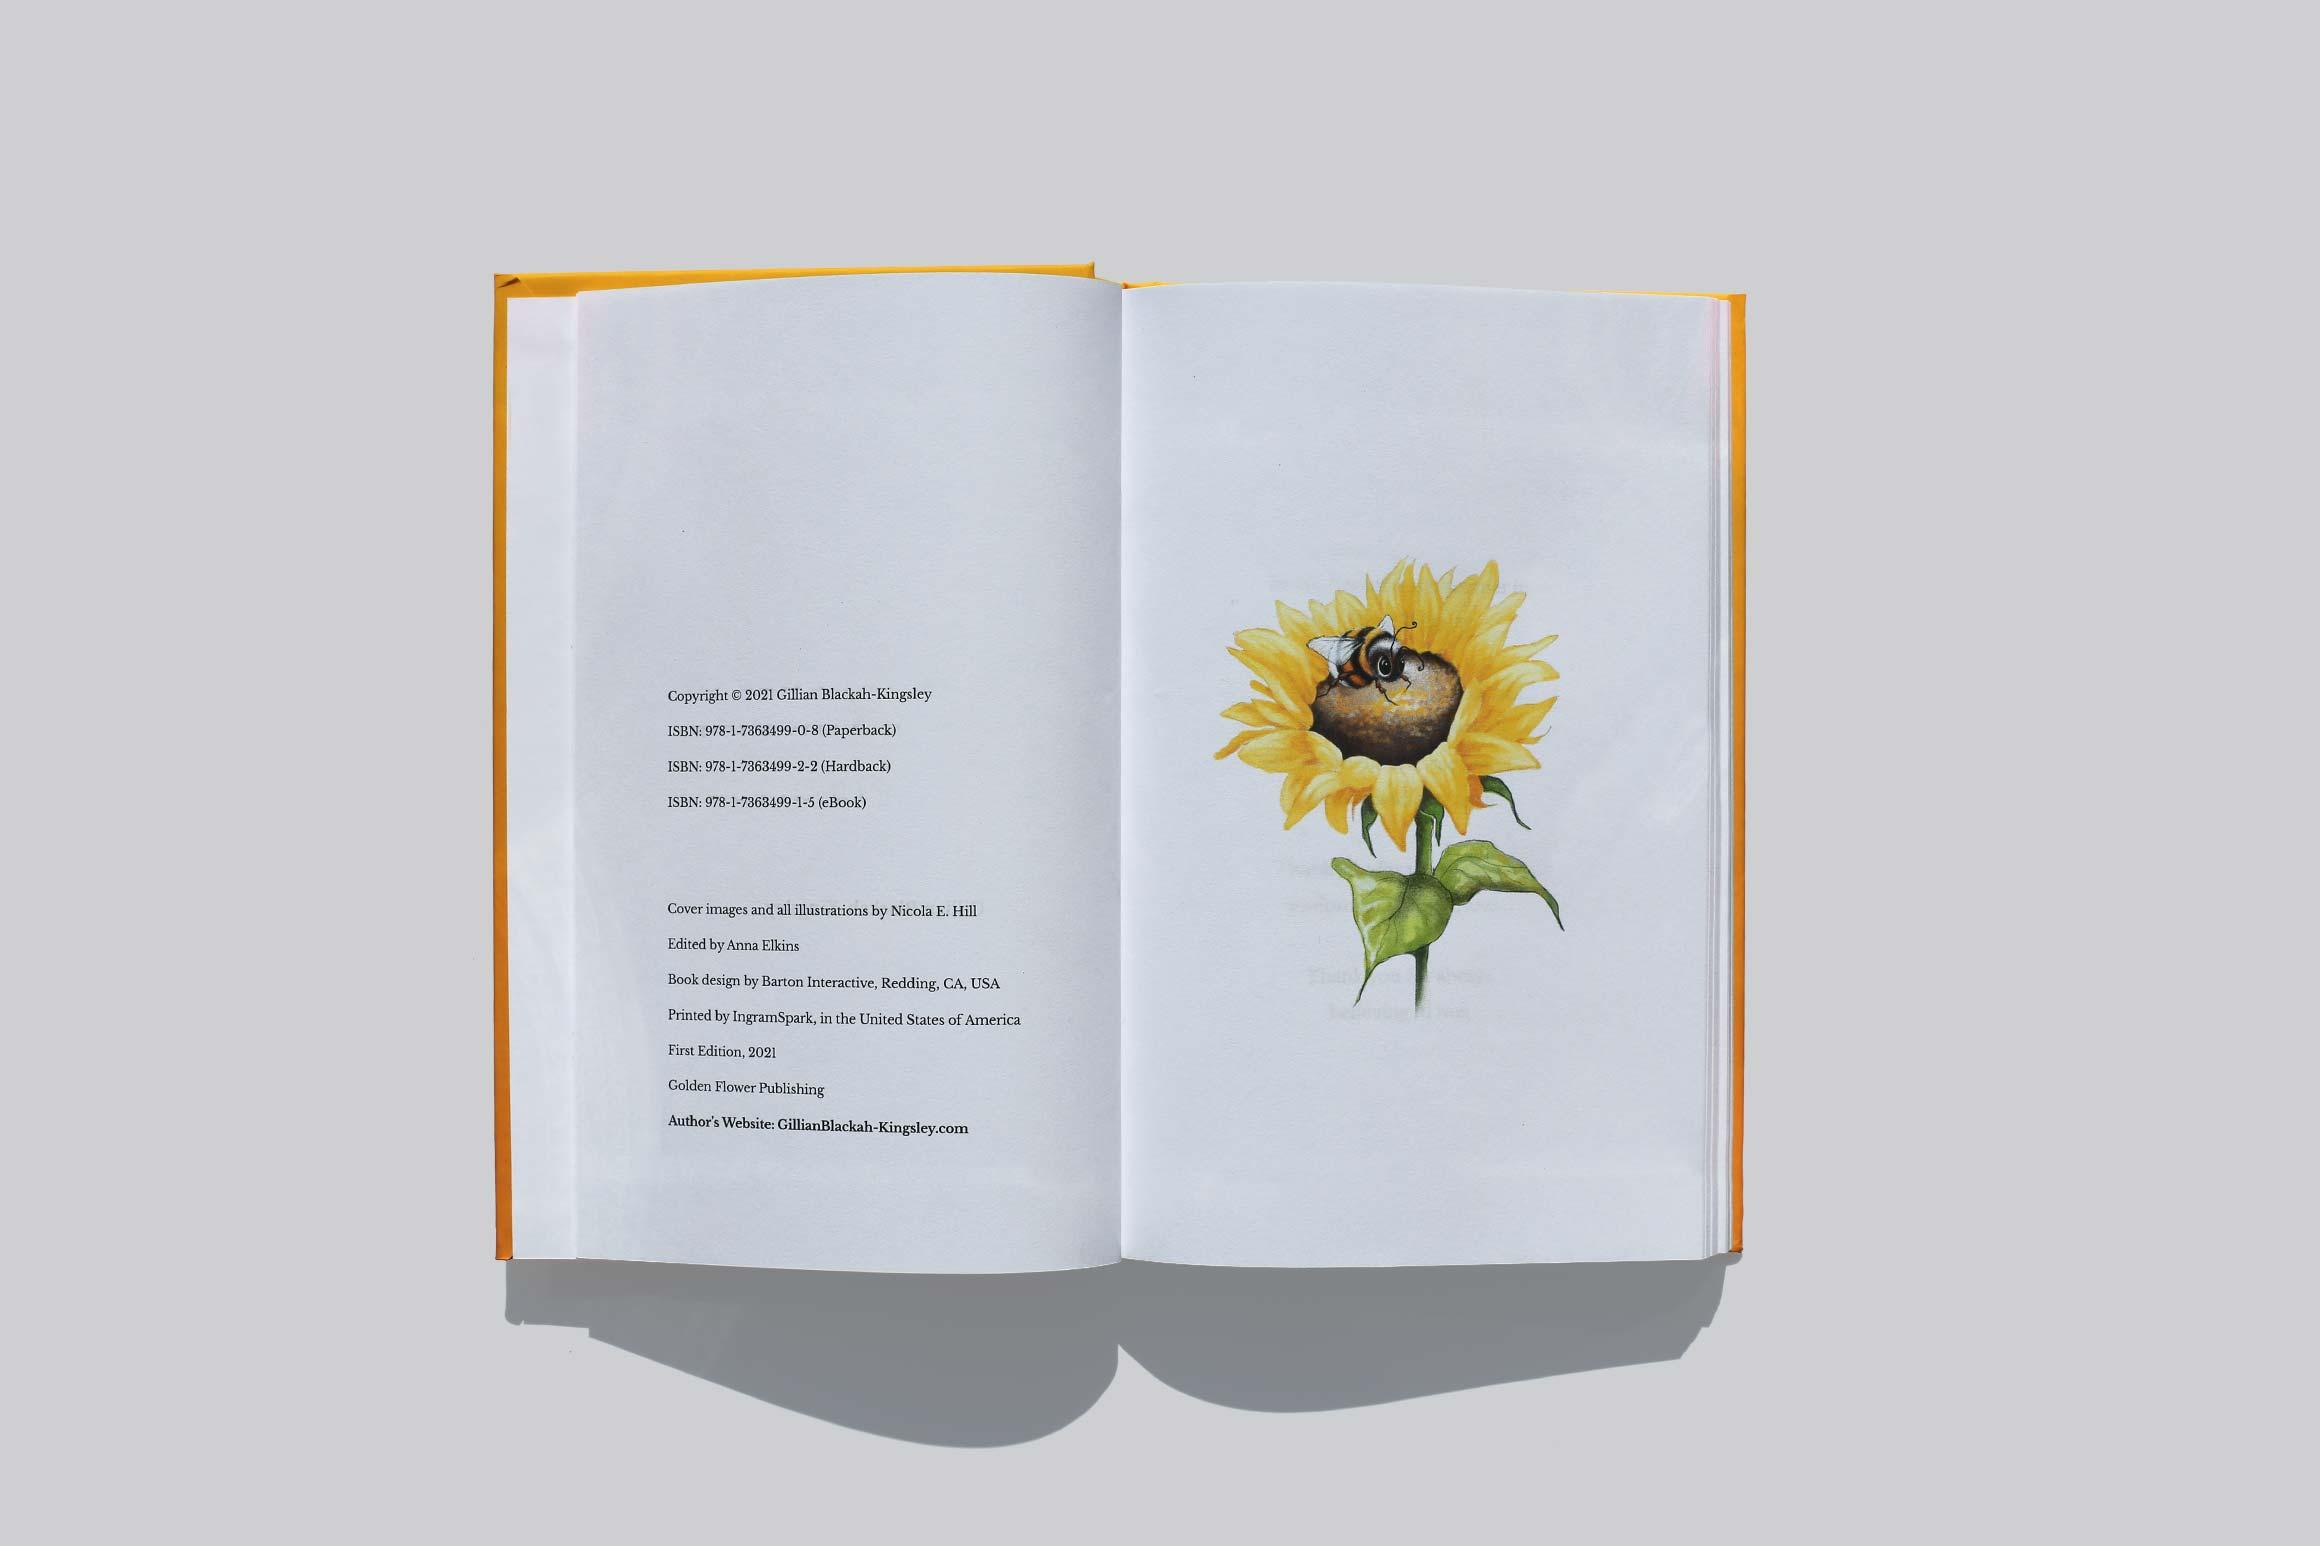 Gillian Kingsley Book Photo